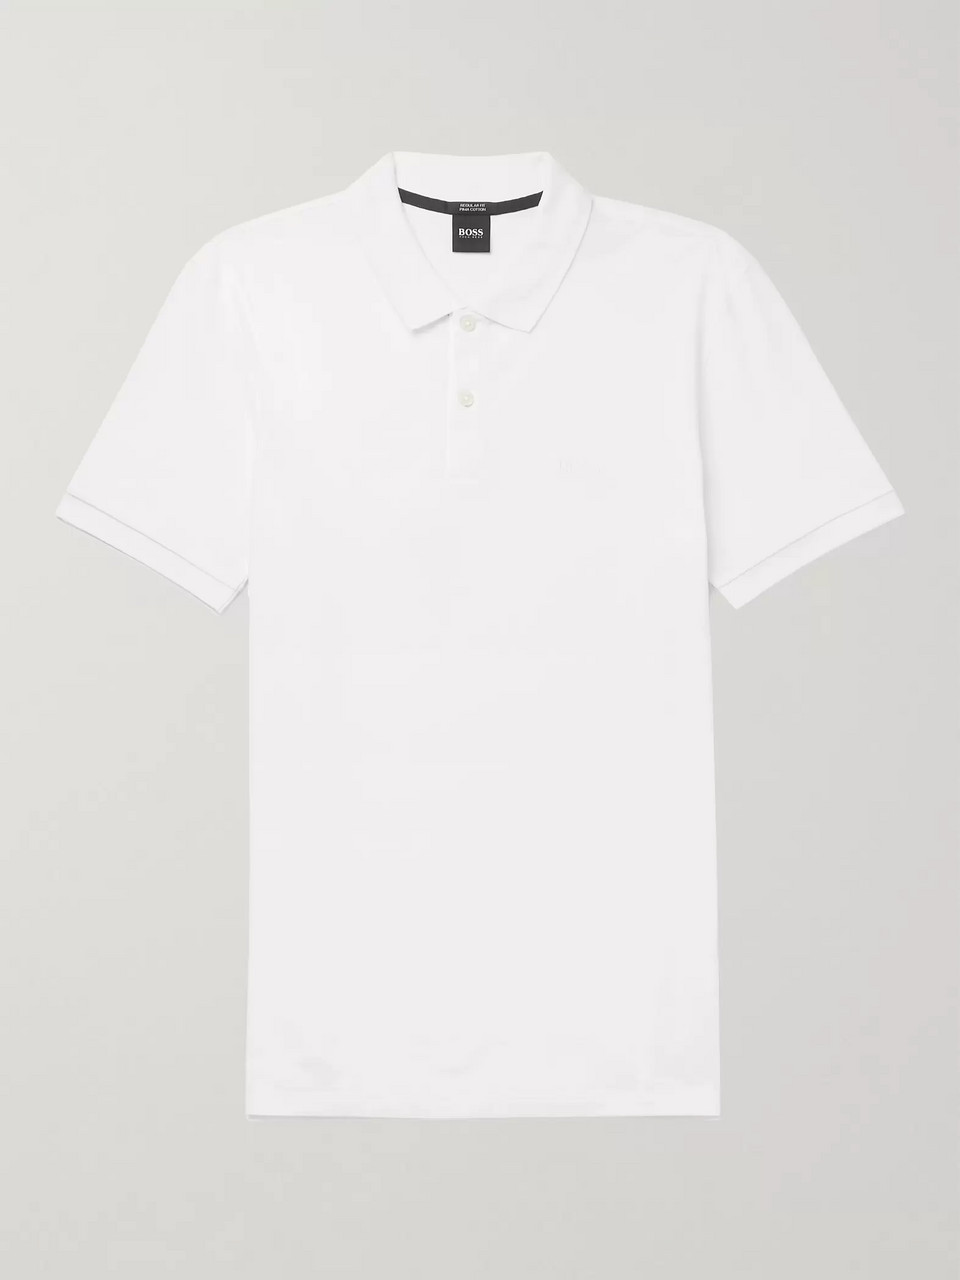 8127b6bc4 White Pallas Cotton-Piqué Polo Shirt | Hugo Boss | MR PORTER